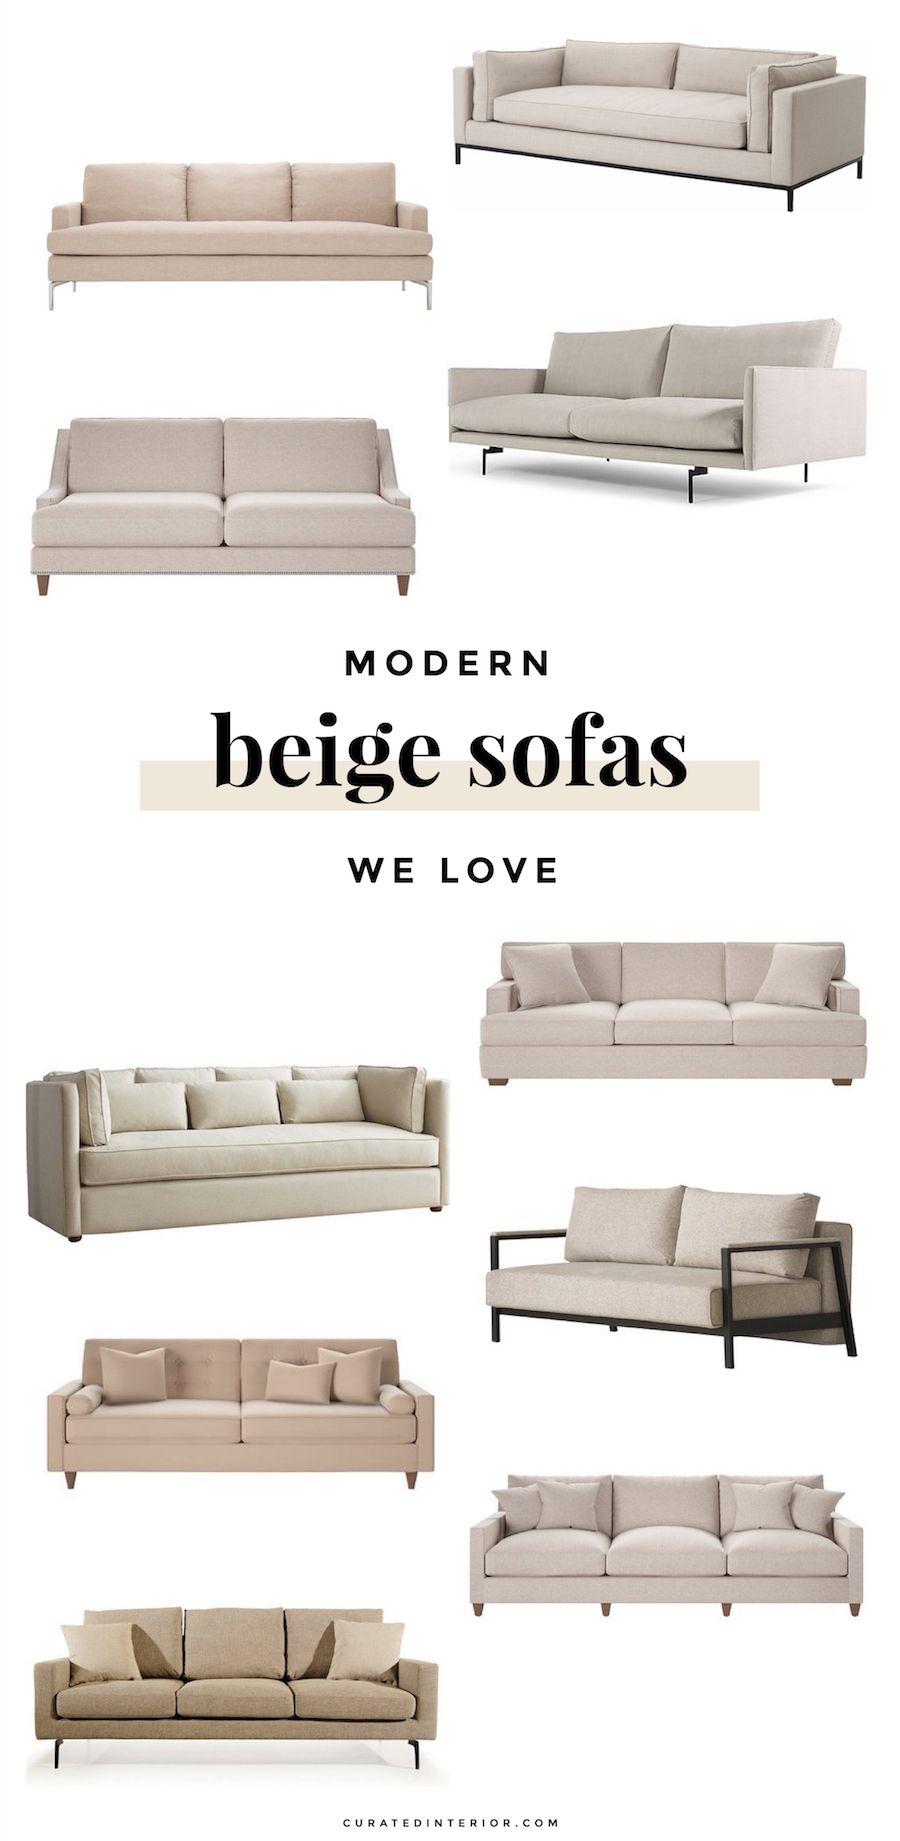 28 Modern Beige Sofas For The Living Room Beige Sofa Living Room Beige Sofa Beige Couch